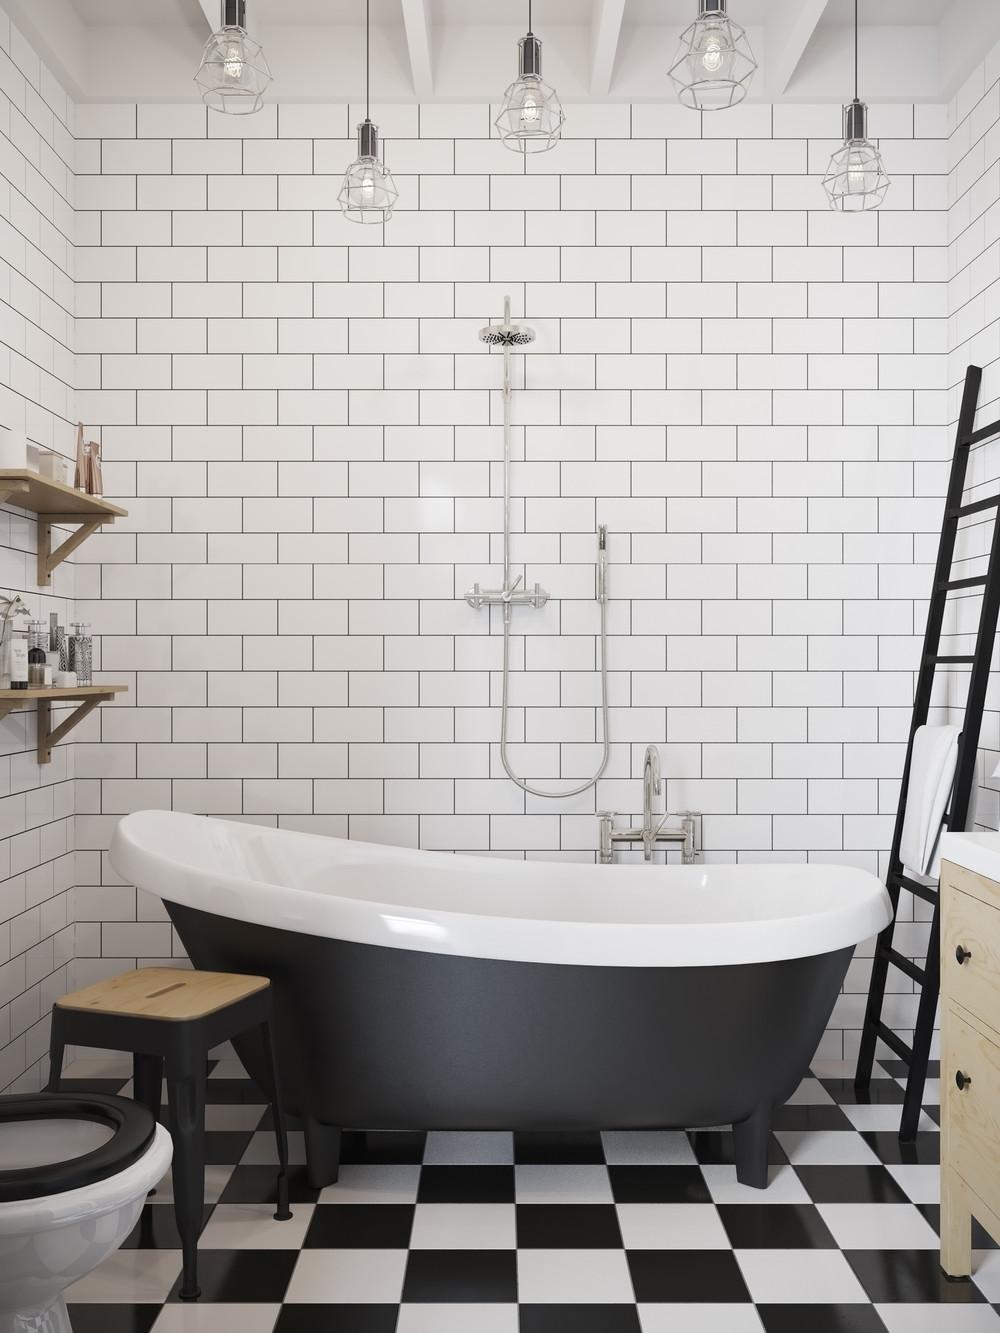 Modern Clawfoot Tub Interior Design Ideas